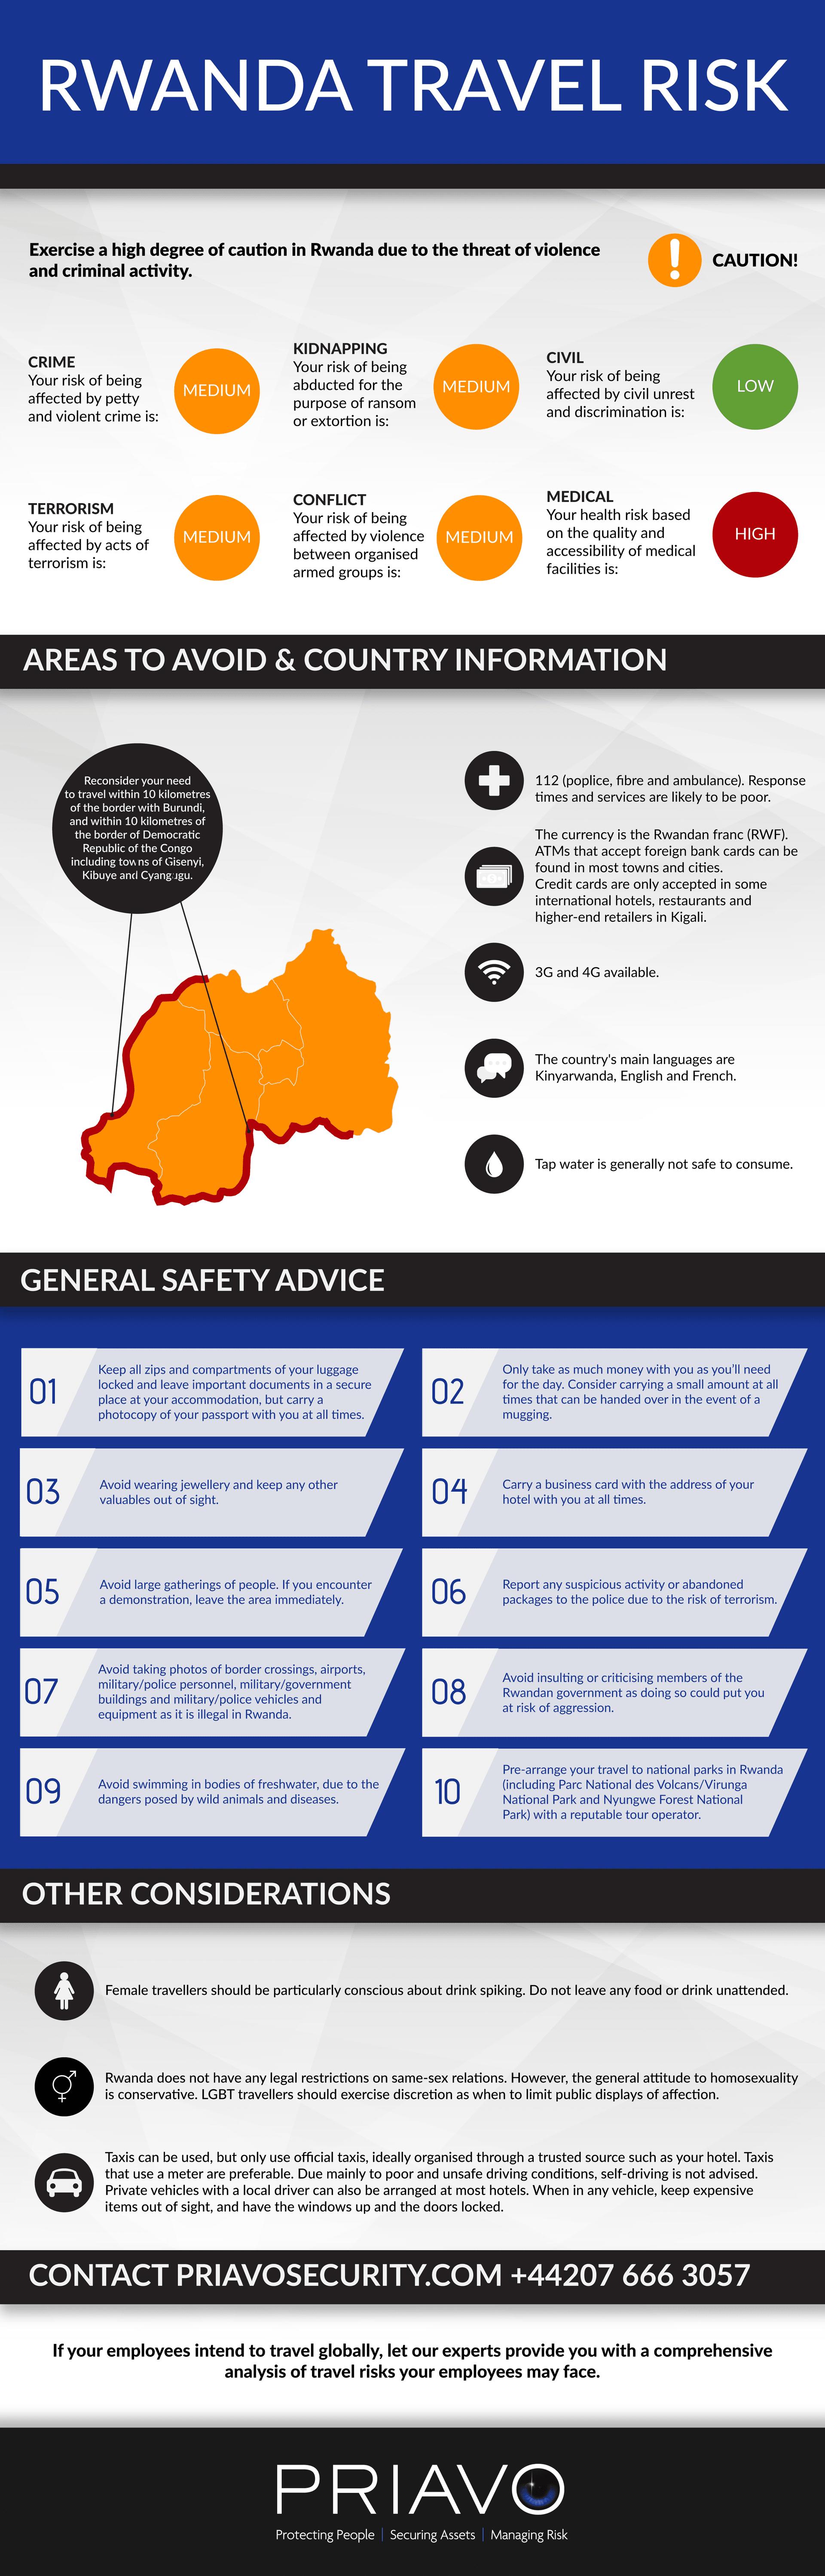 Travel Risk Report Rwanda